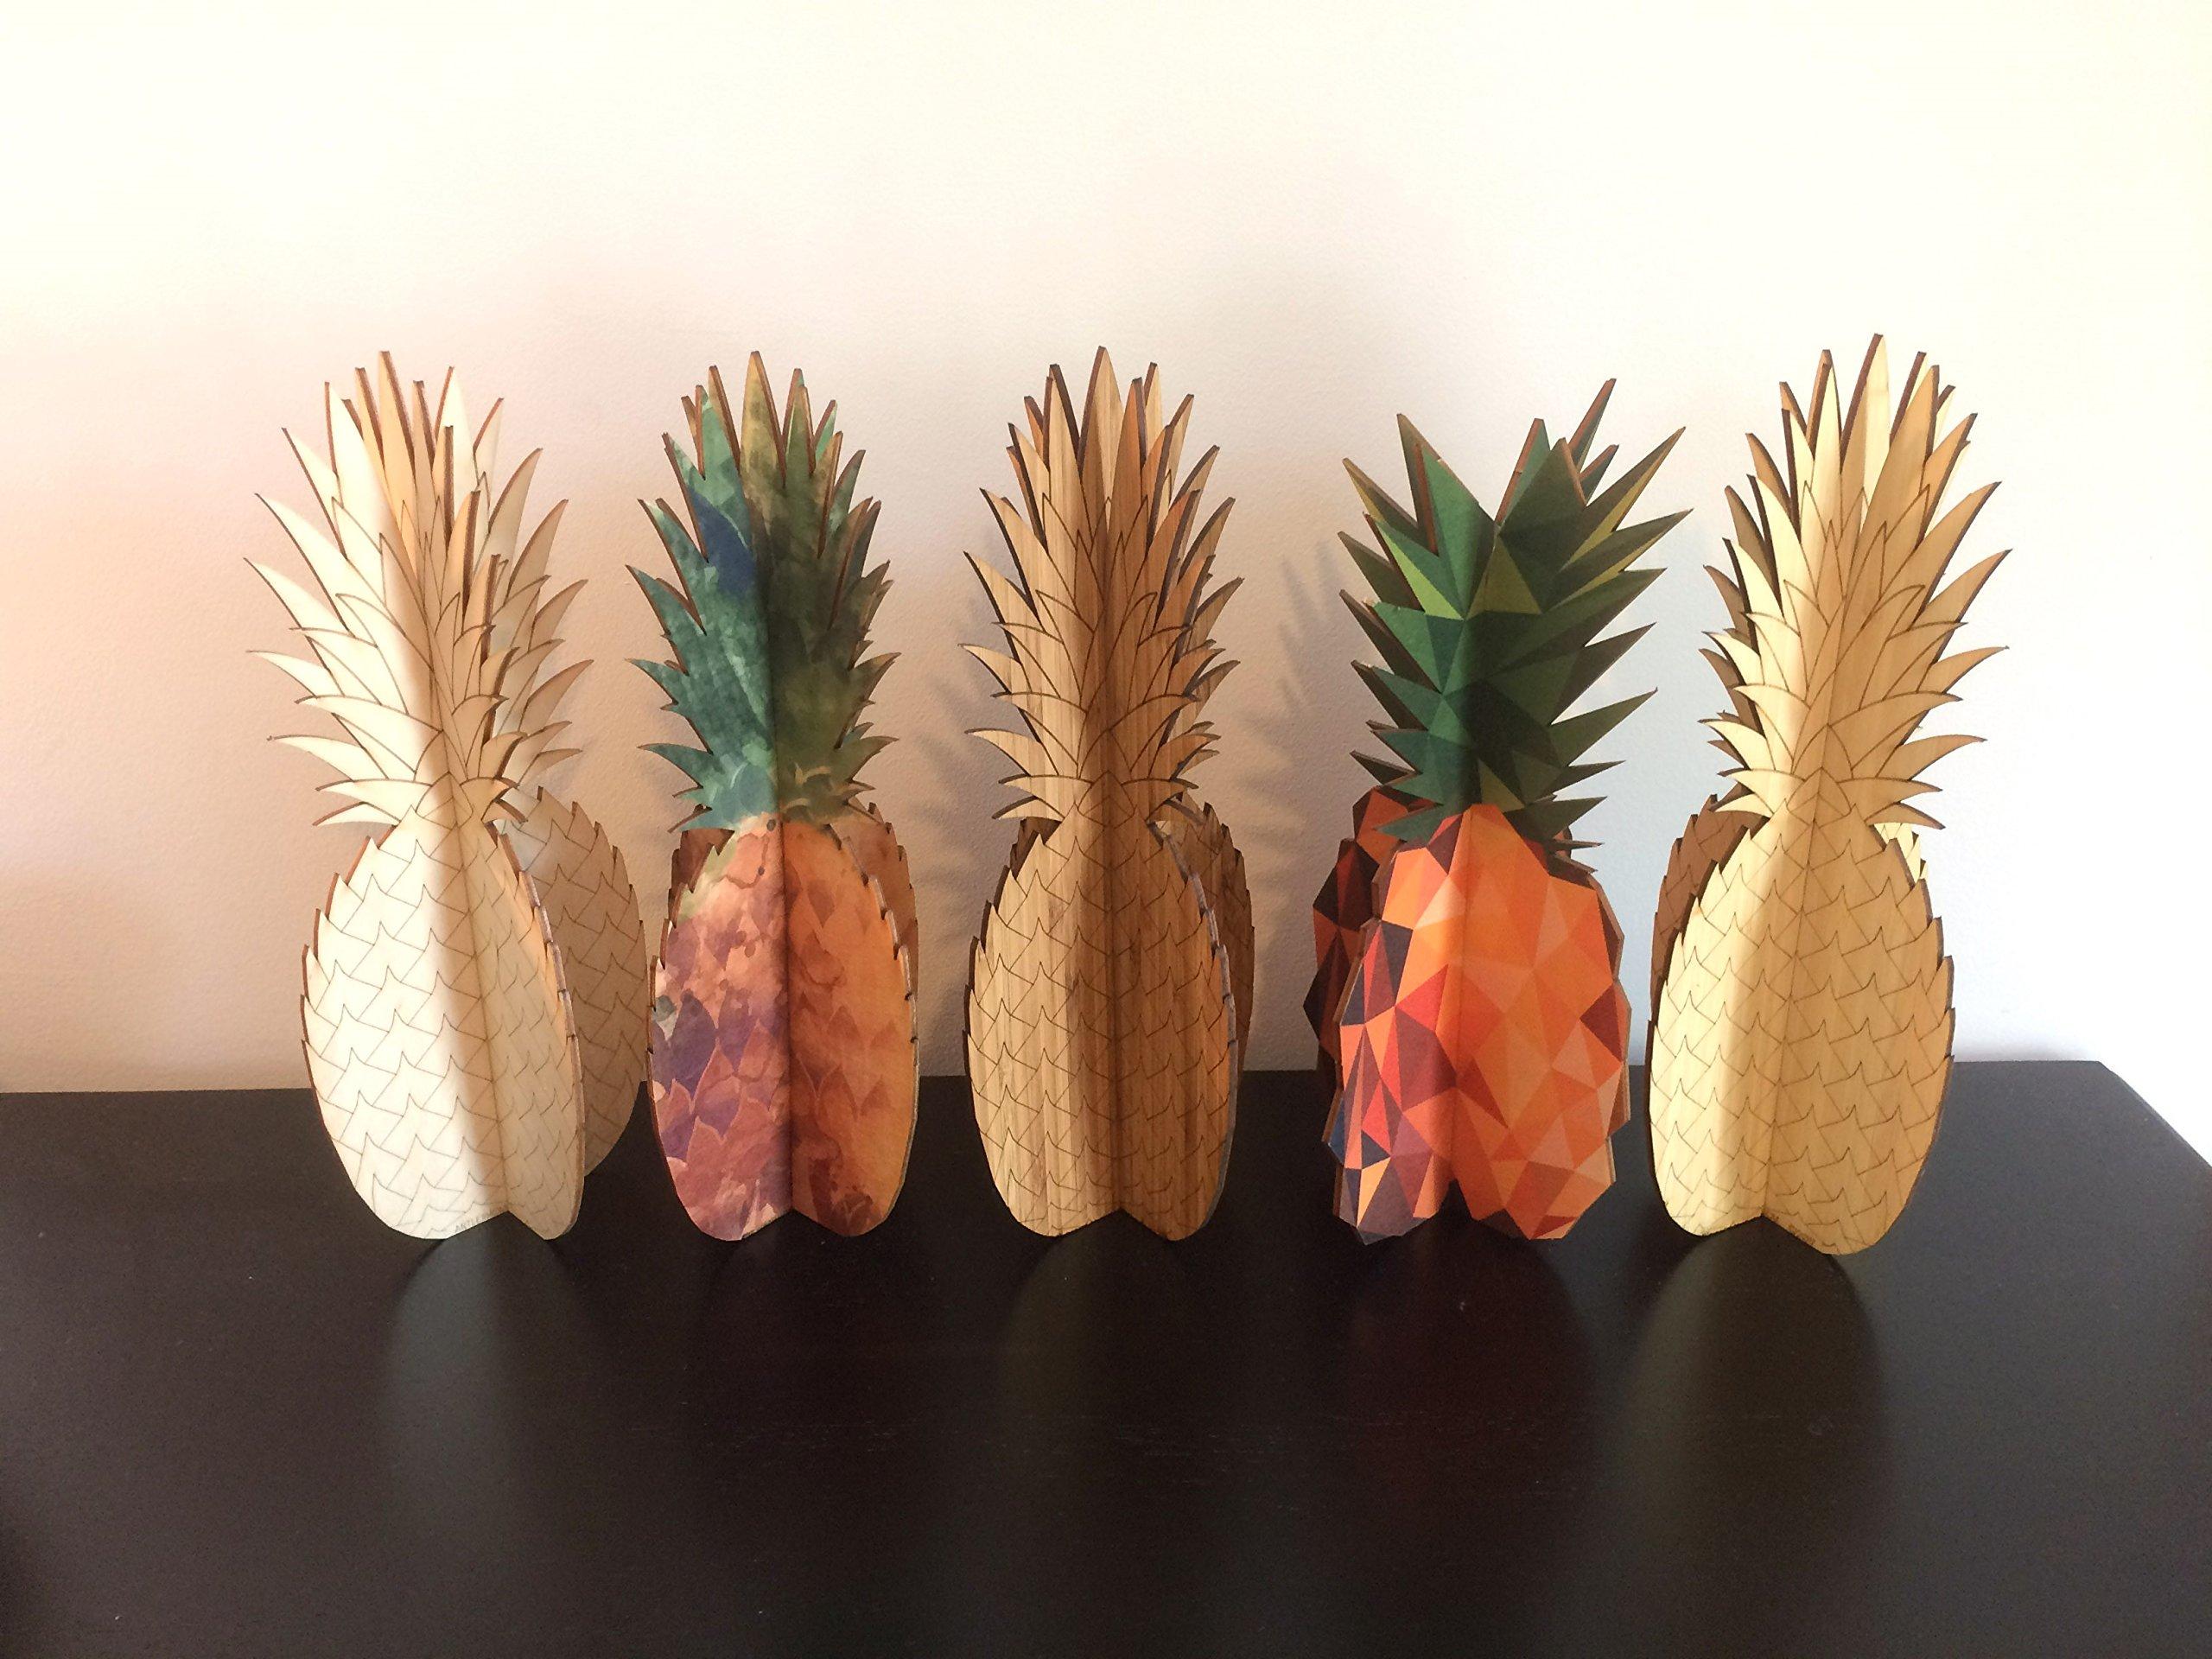 Cardboard Safari Wood Pineapple Home Decor Piece | Made in the USA (Watercolor Birch) by Cardboard Safari (Image #1)